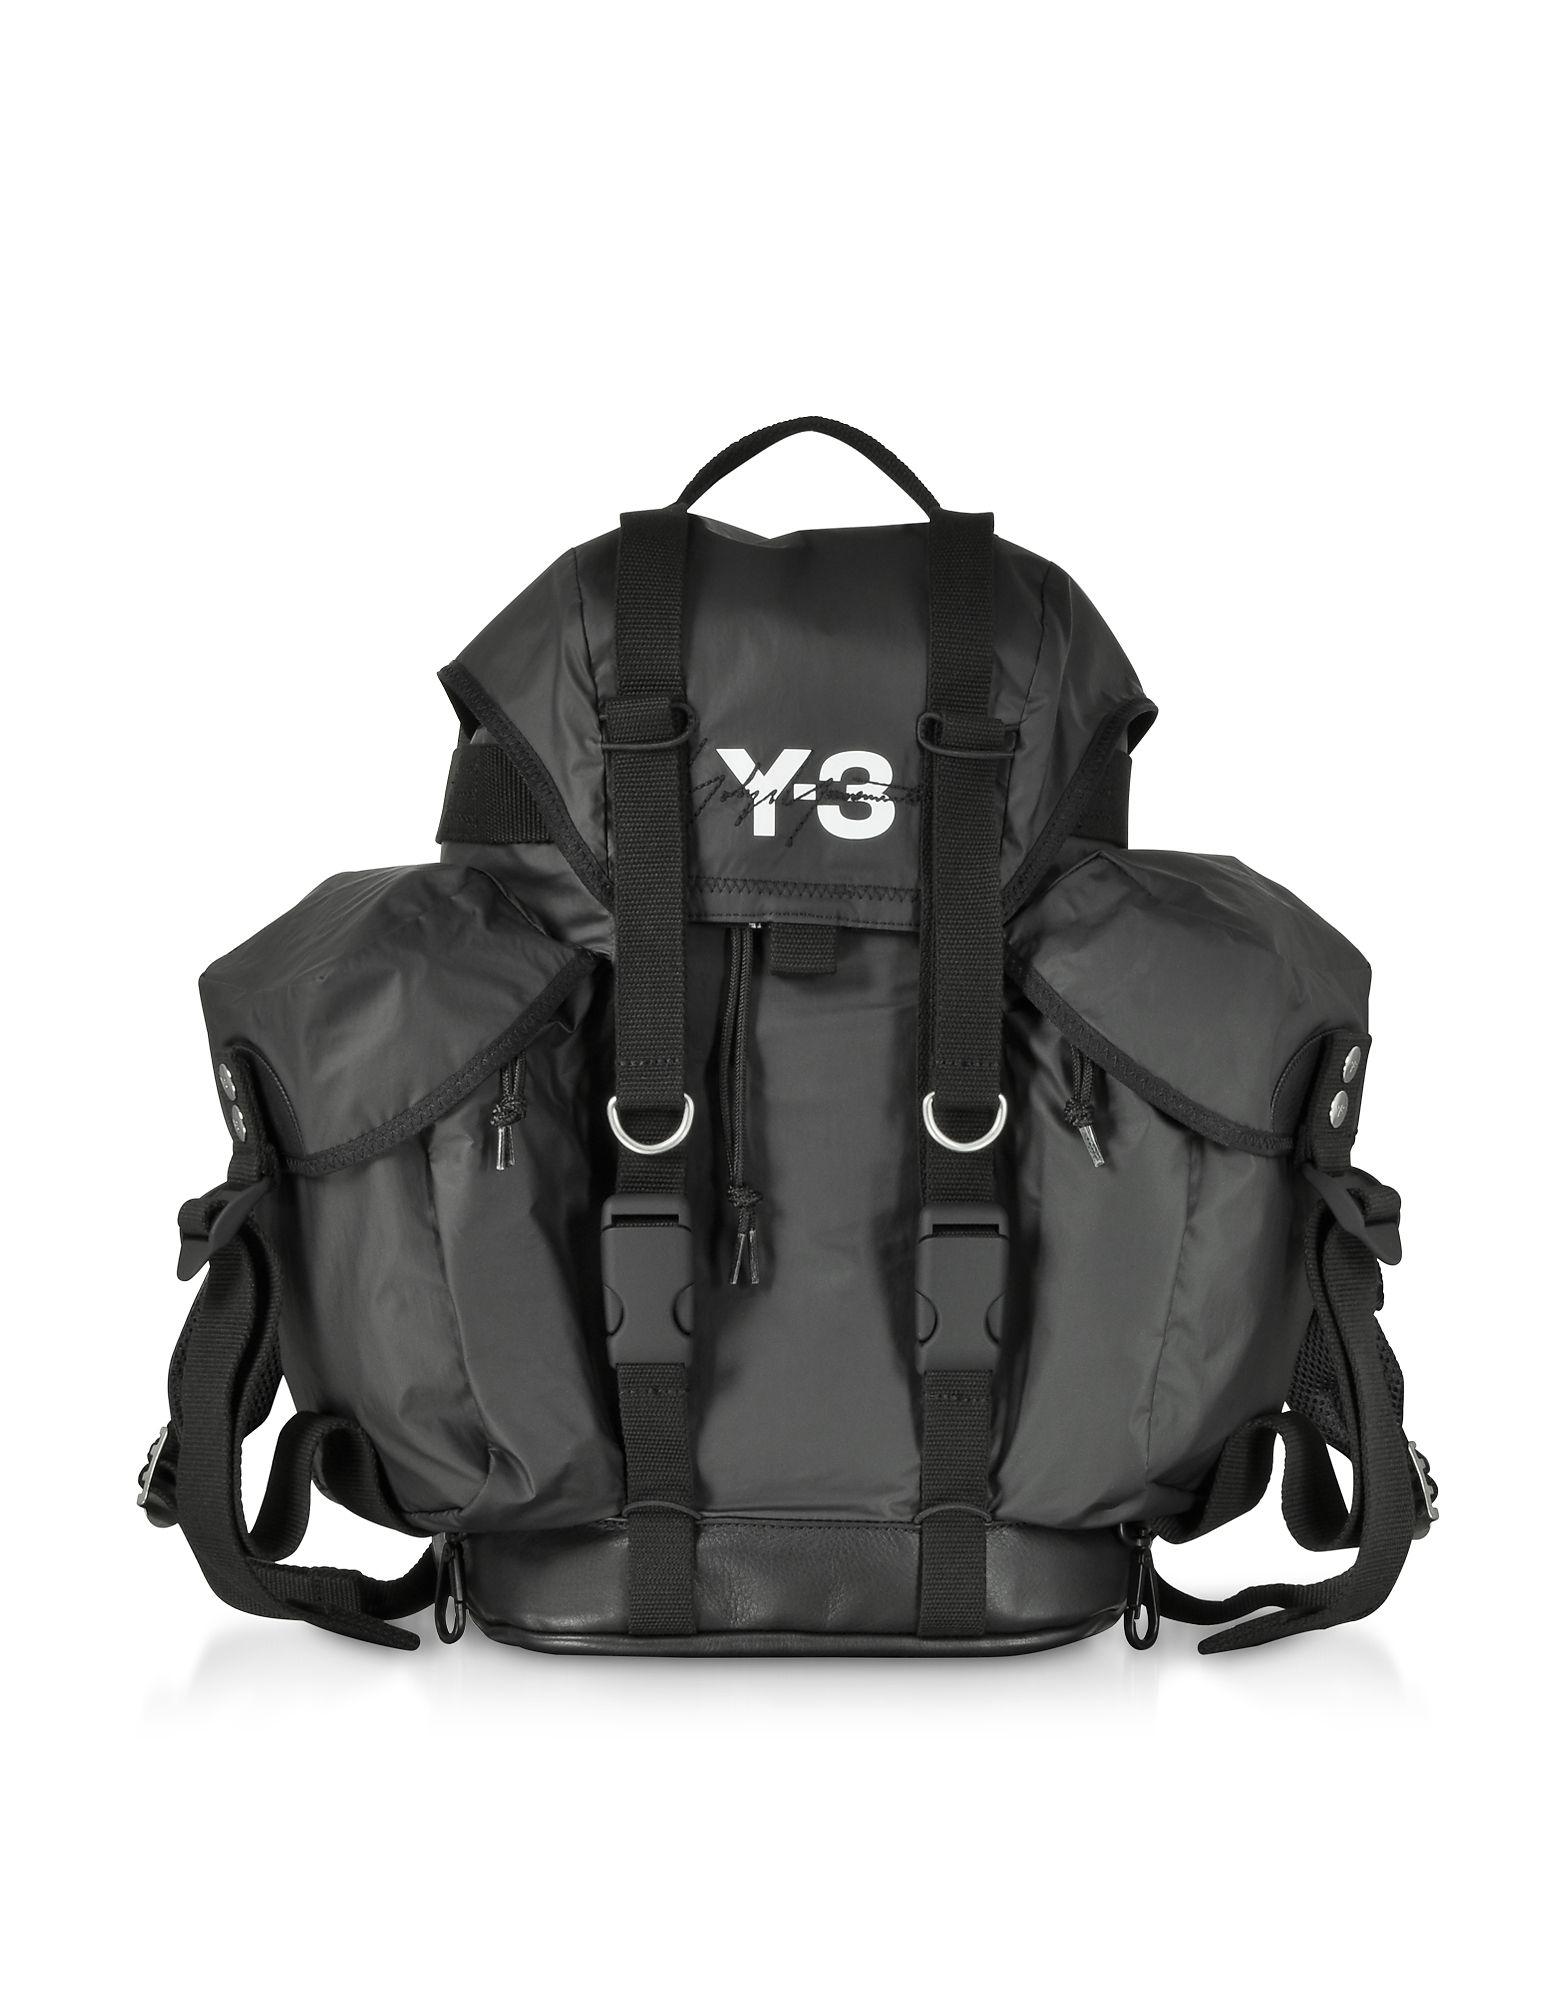 40712f4df3af Y-3 BLACK NYLON XS UTILITY BACKPACK. #y-3 #bags #nylon #backpacks ...